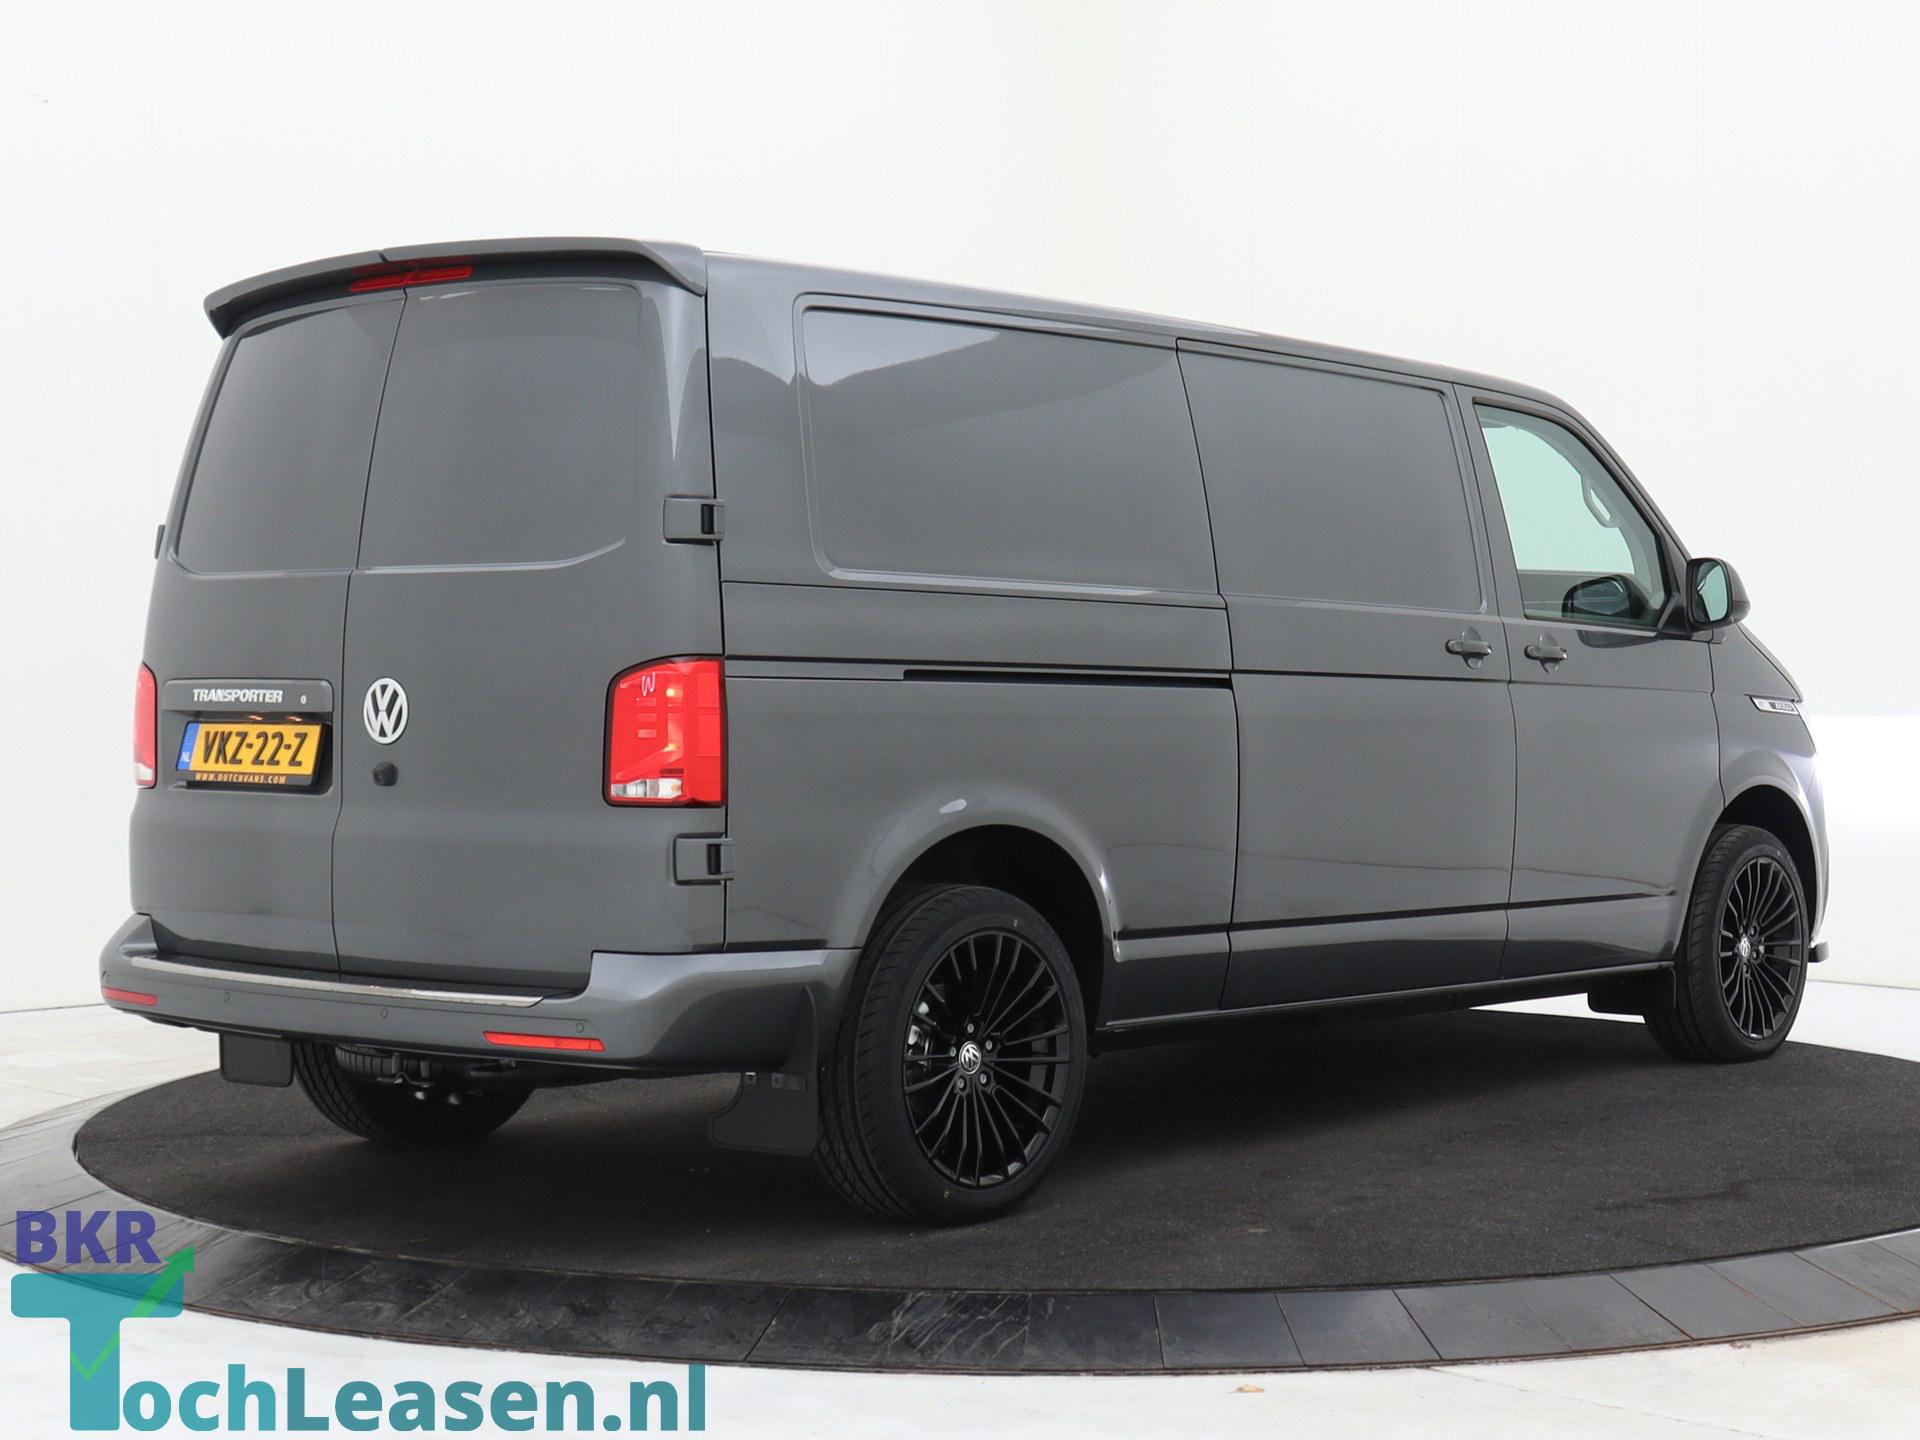 BKR toch leasen - Volkswagen Transporter - Grijs 18